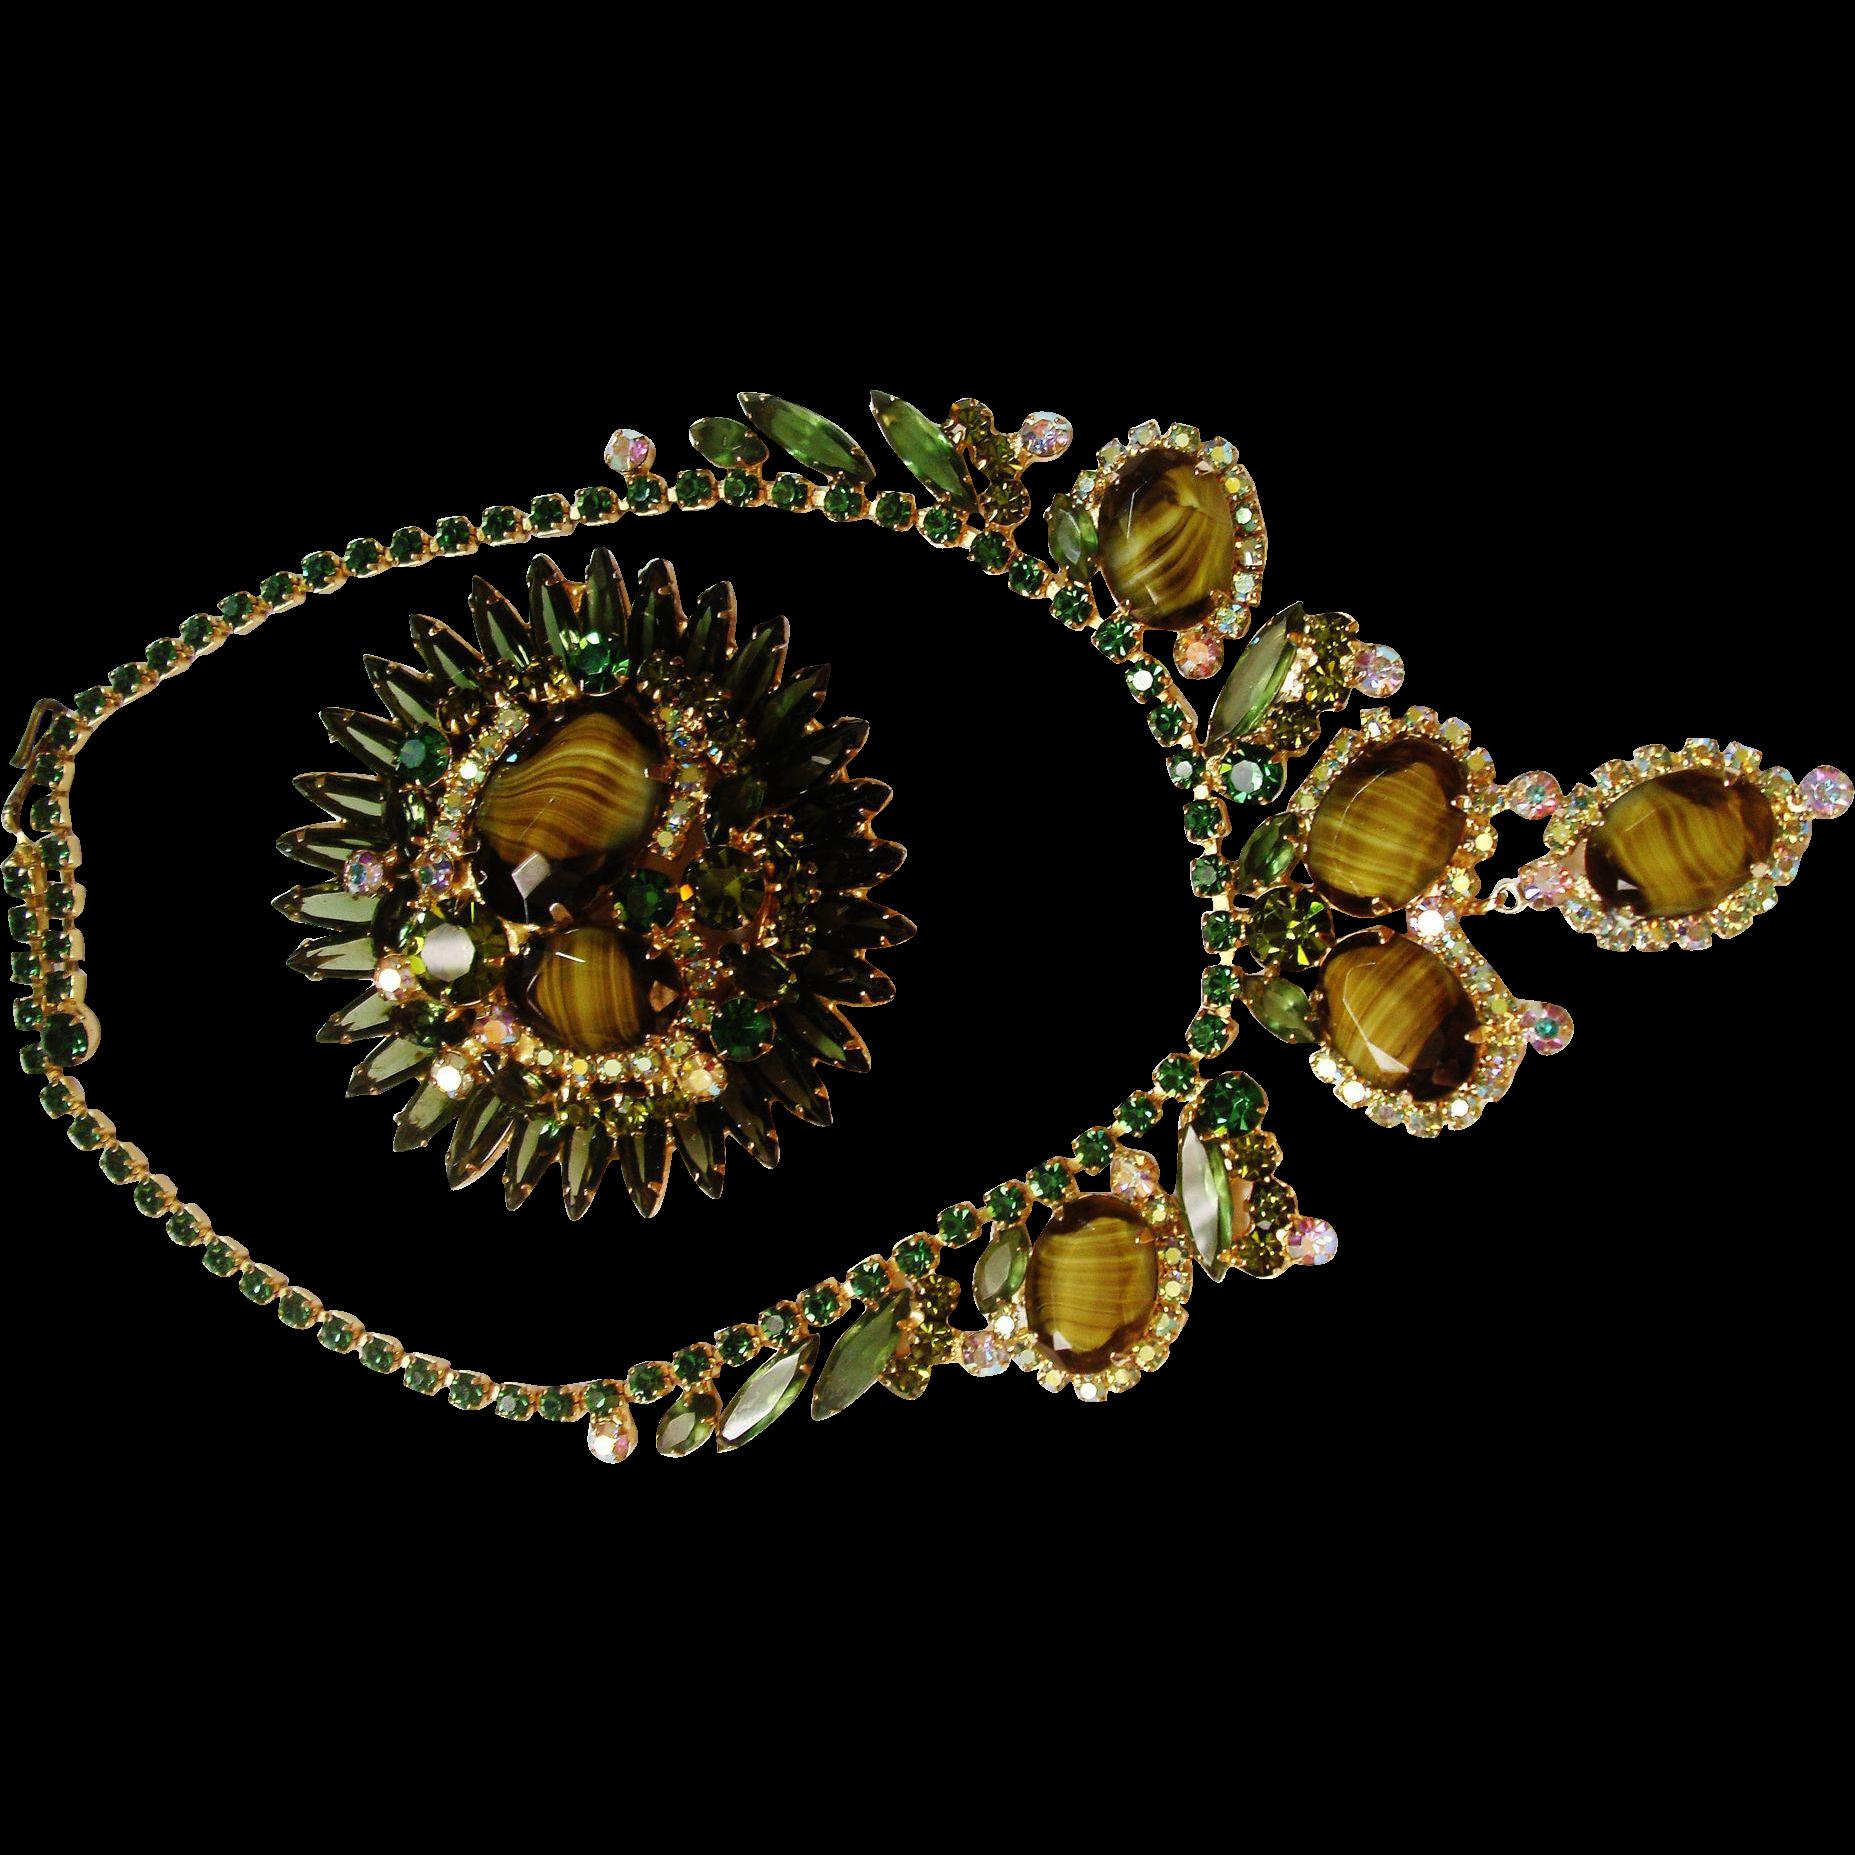 Verified D&E Juliana Green Slag Glass Necklace & Brooch